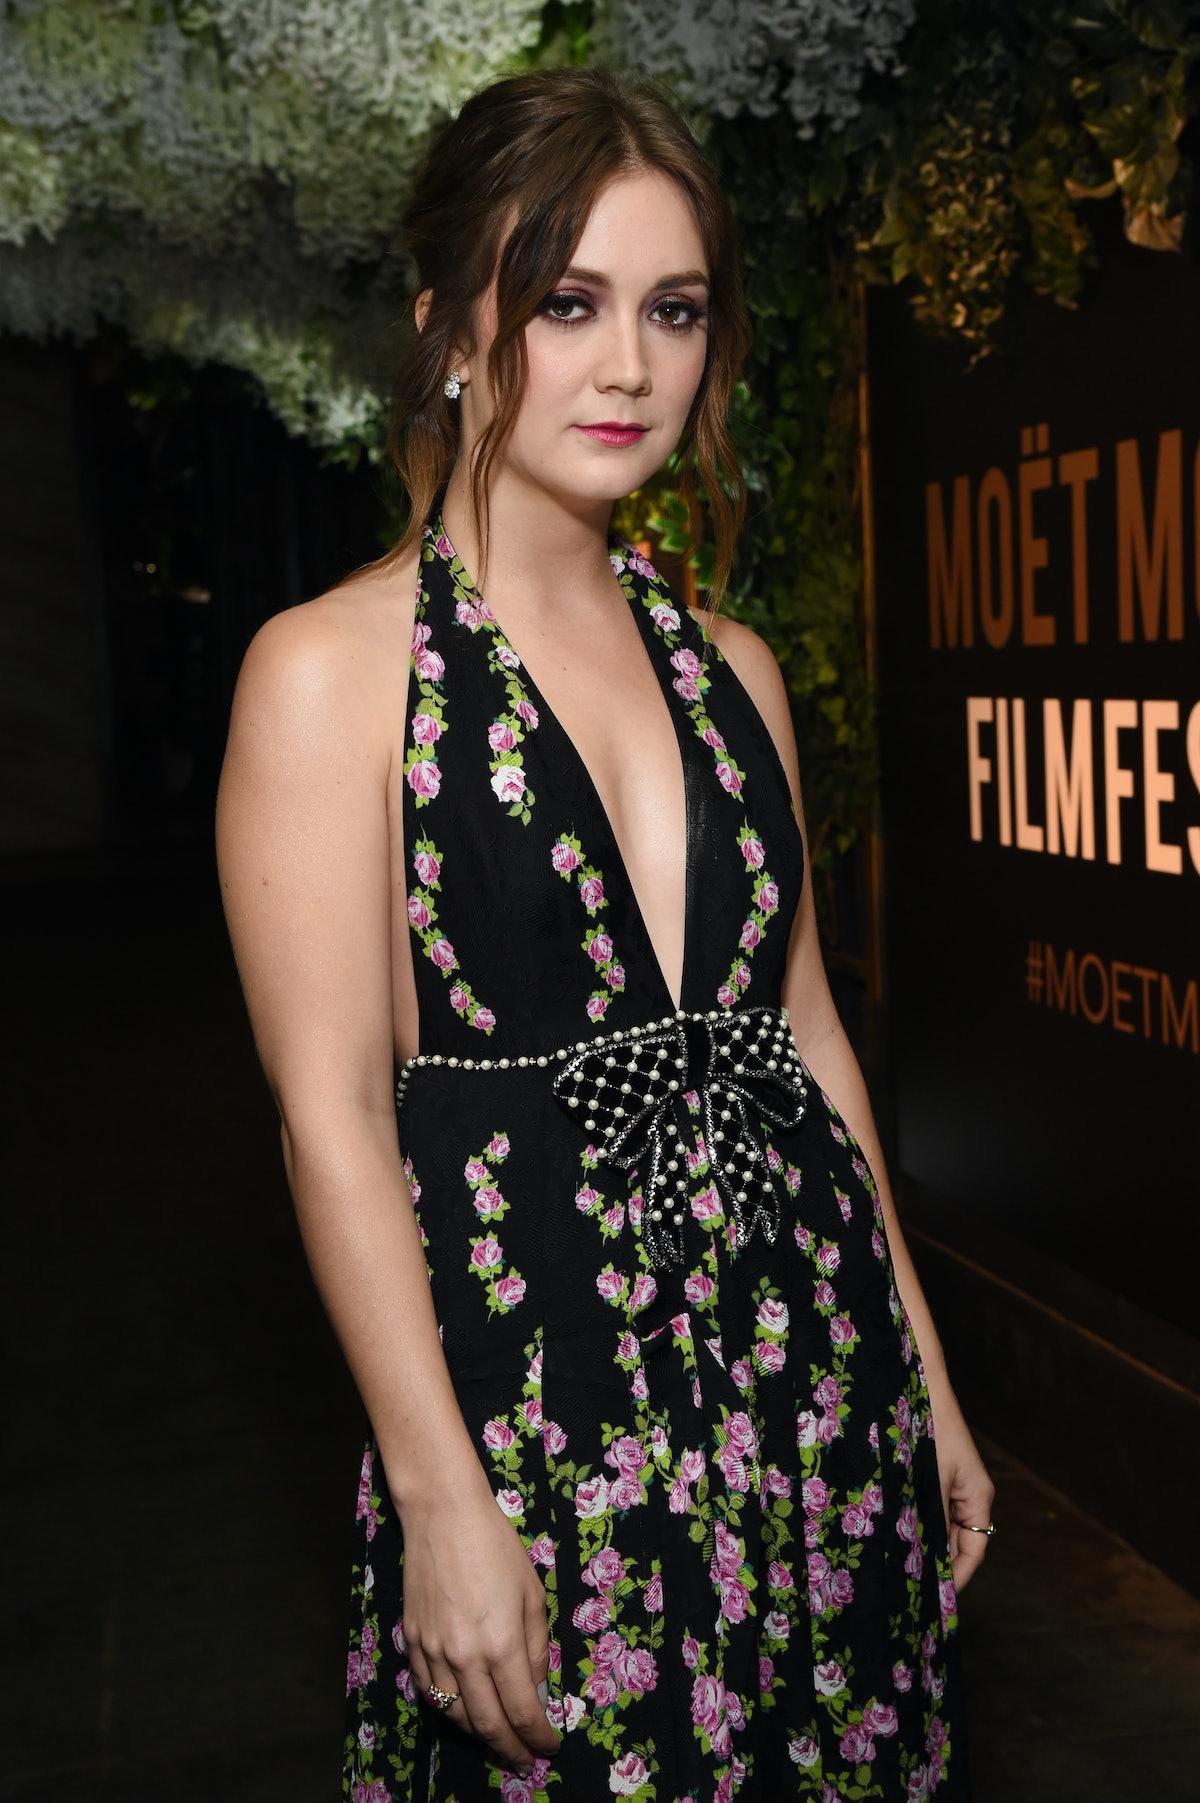 Moet & Chandon Celebrates The 3rd Annual Moet Moment Film Festival and Kicks off Golden Globes Week